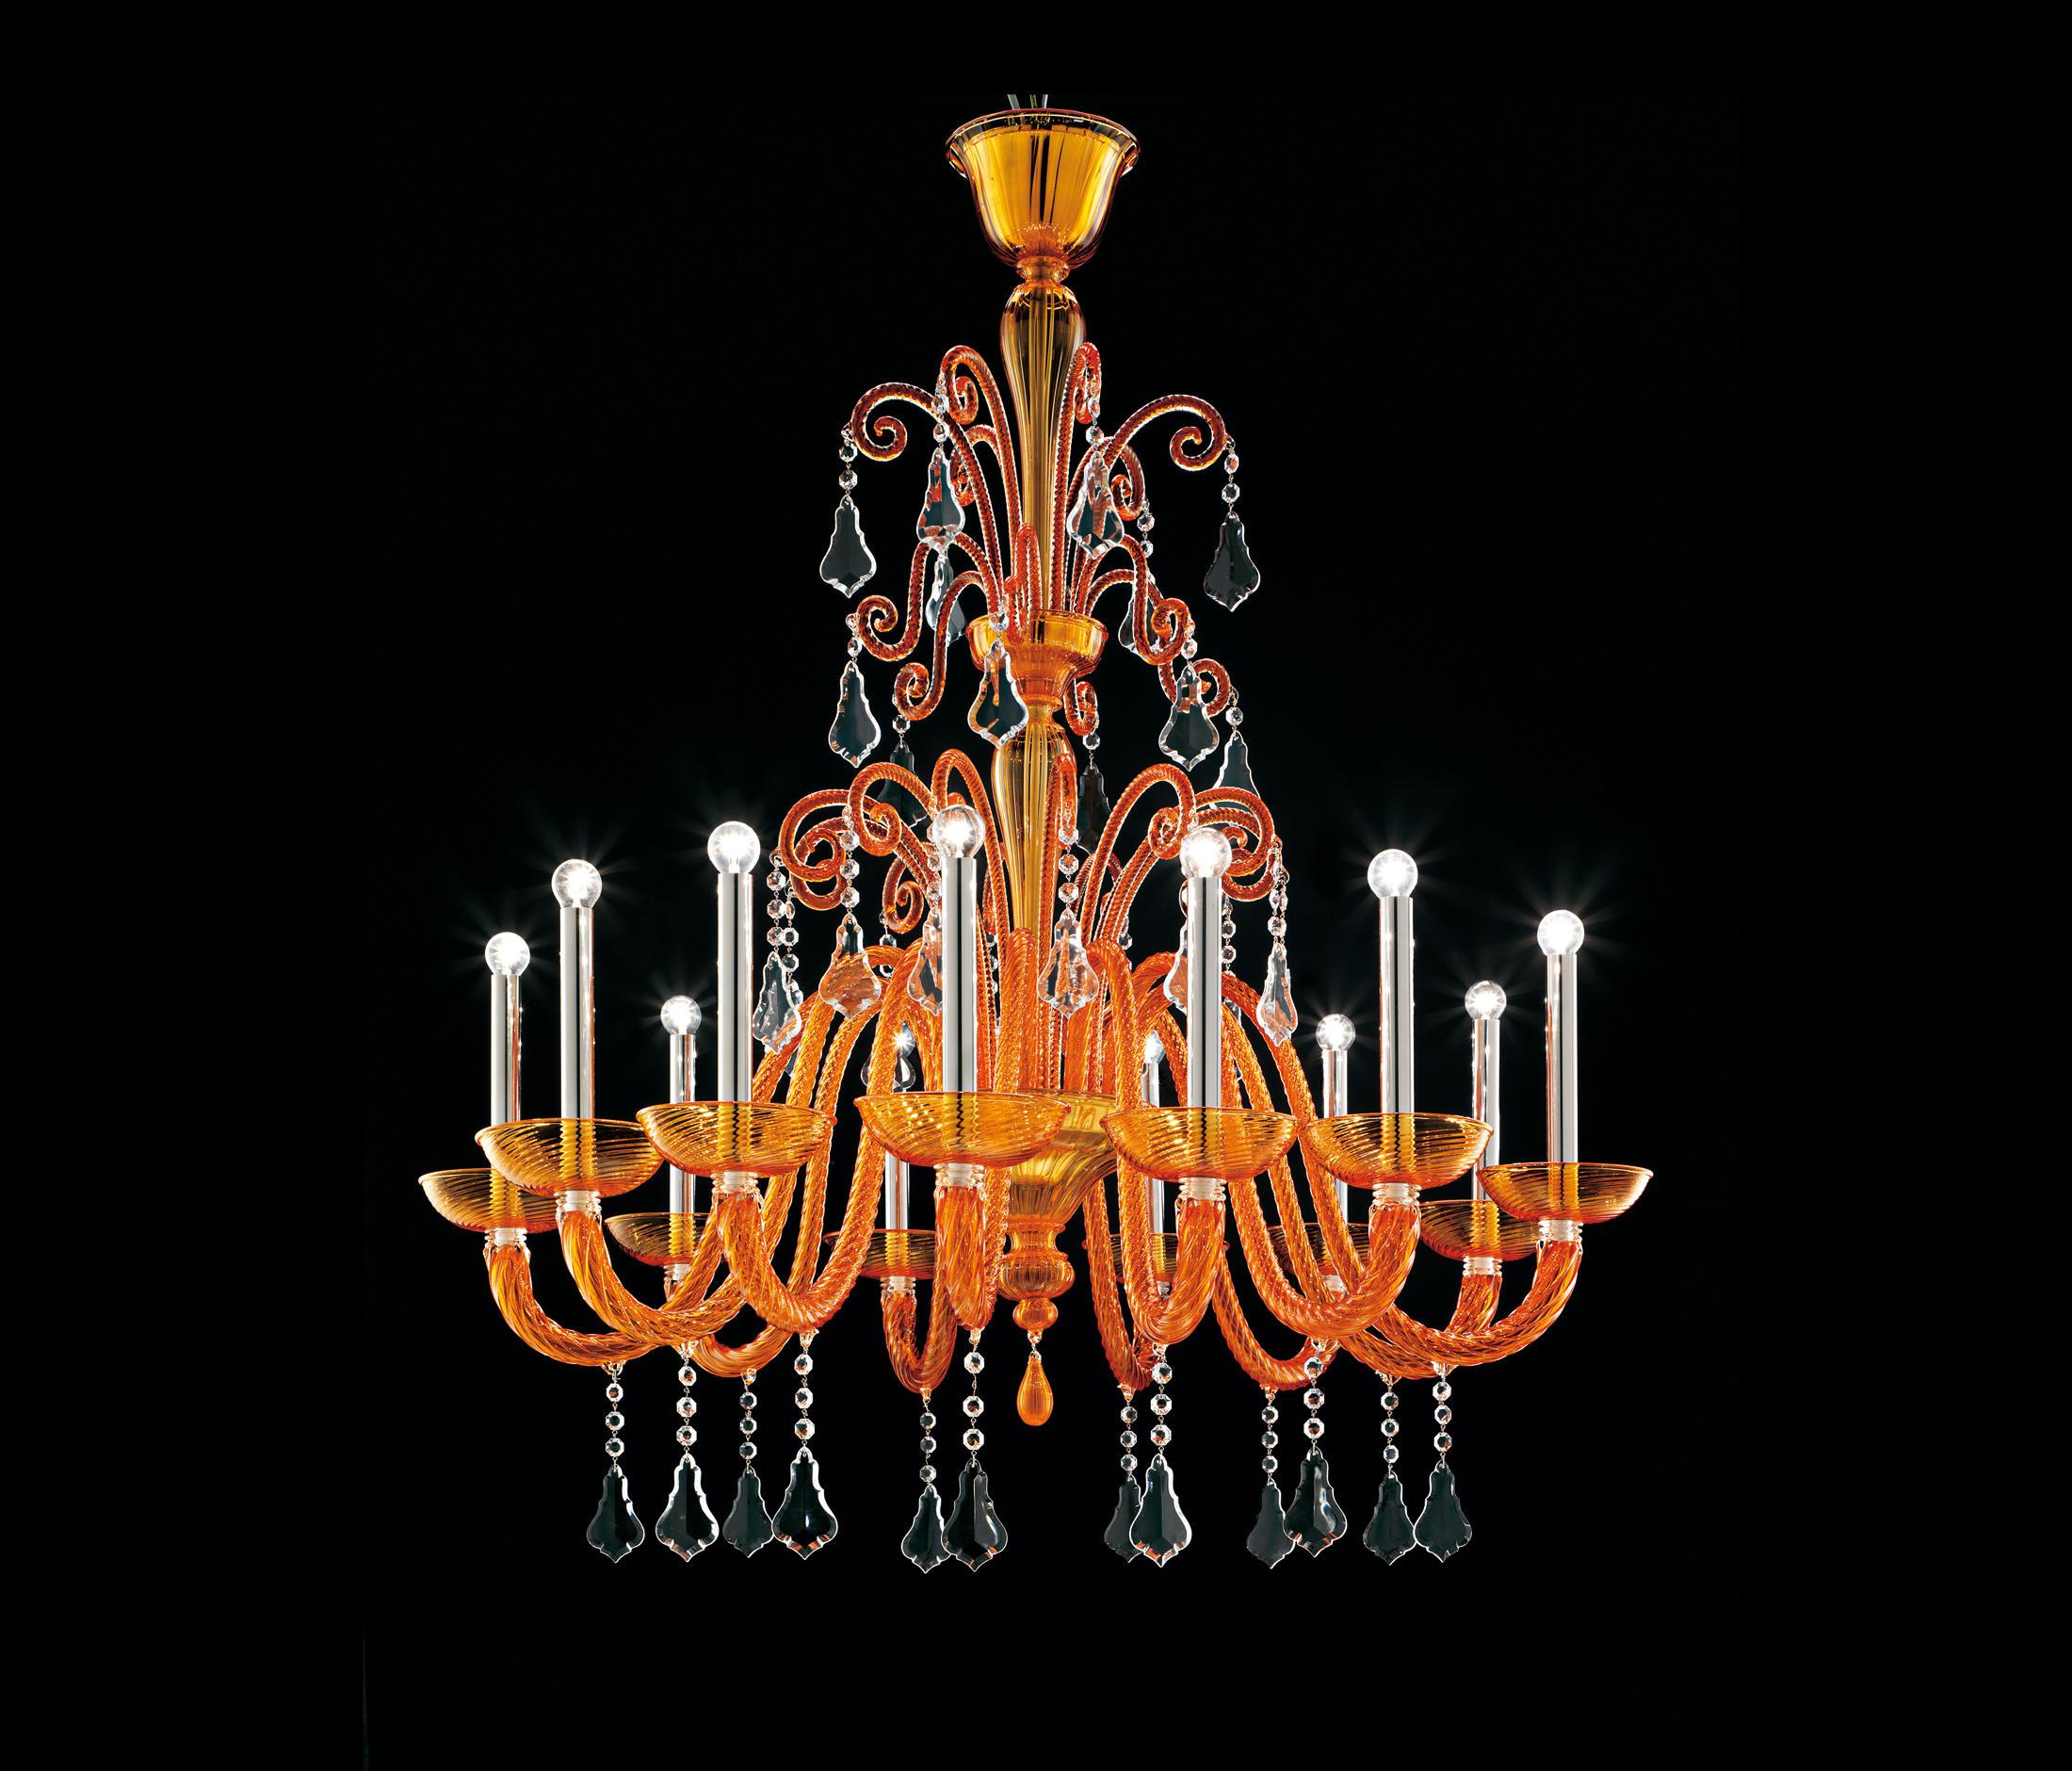 lighting products chandelier nova orange bliss galilee description